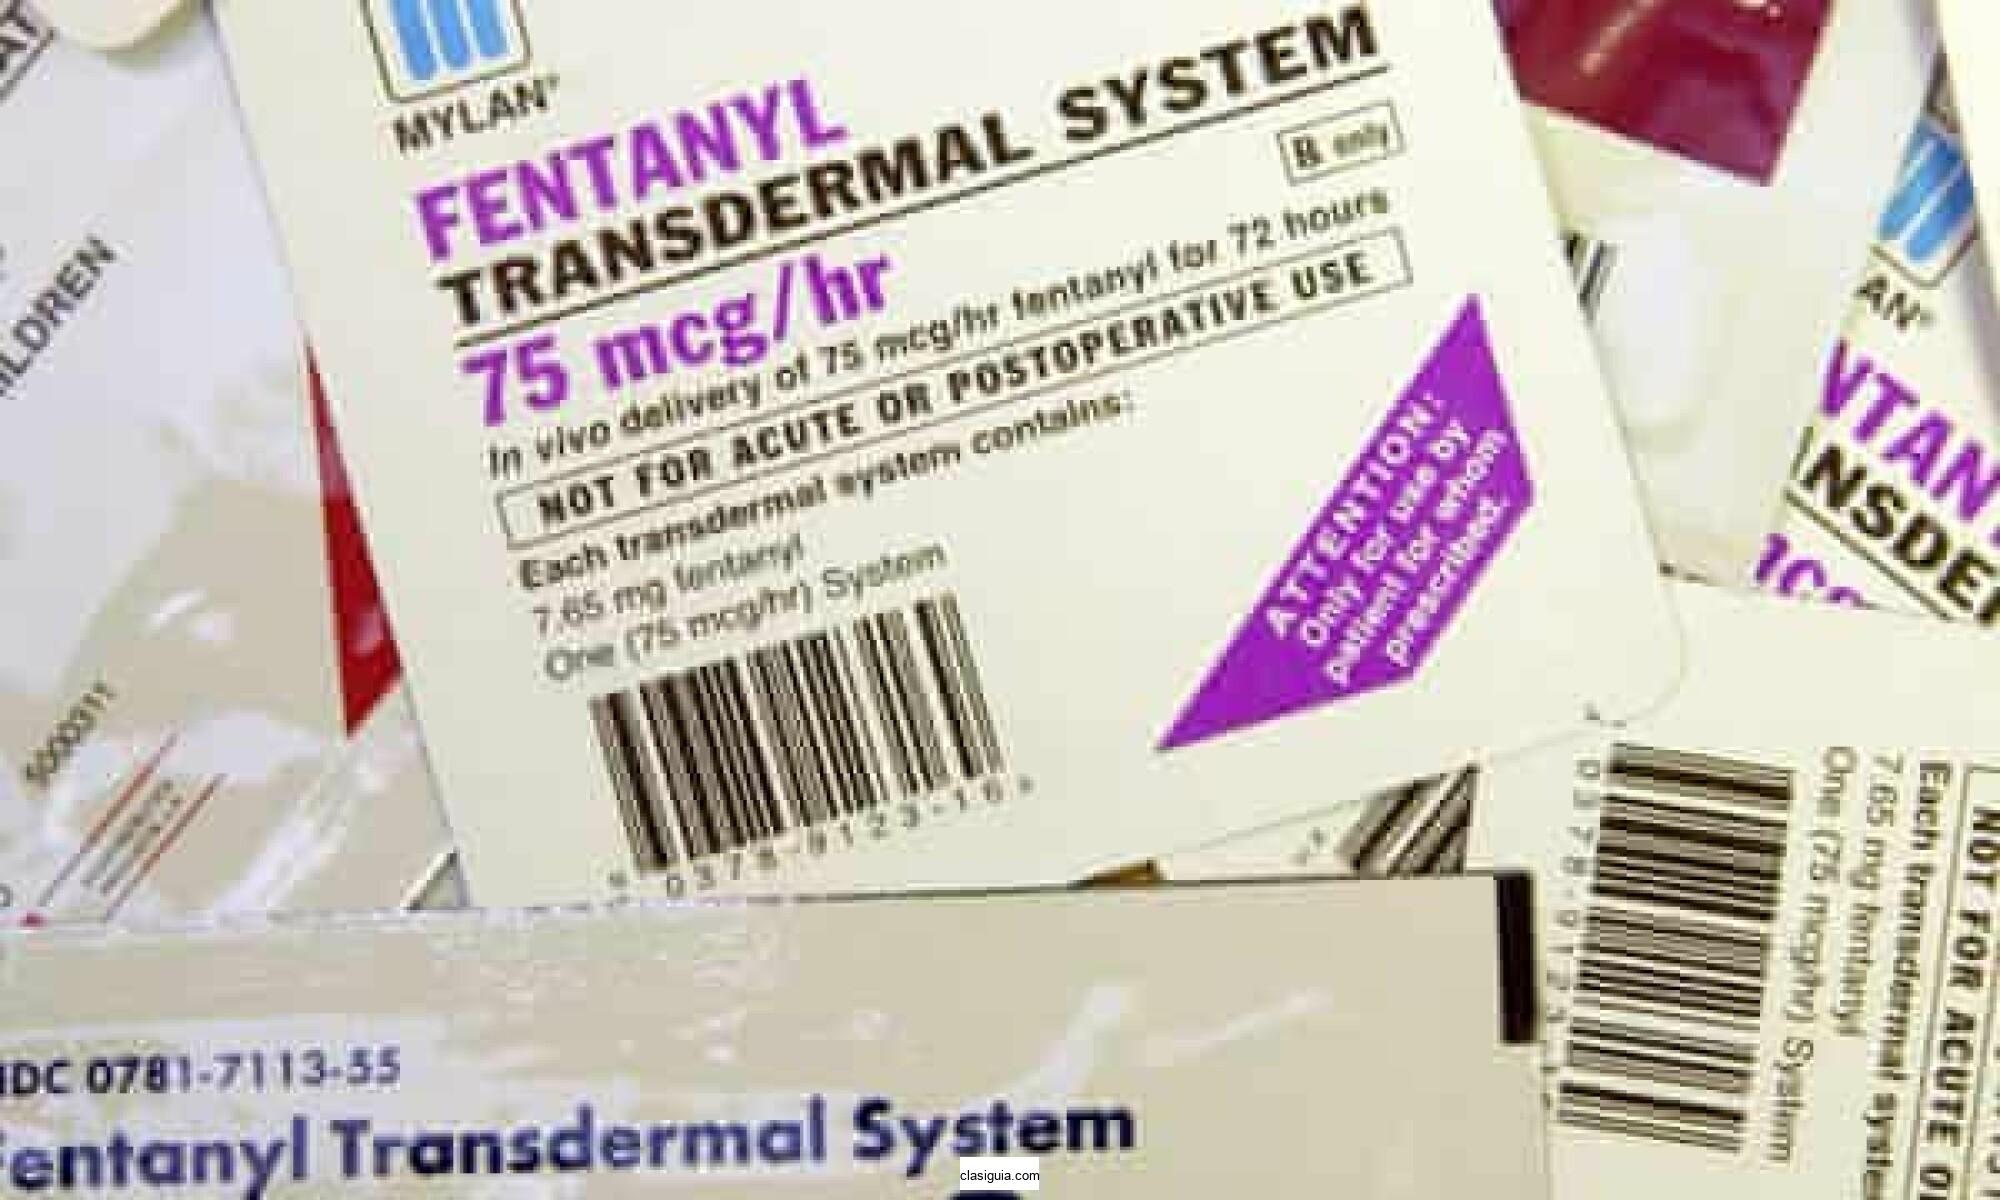 Acquista Fentanyl Online (Acquista Fentanyl Antidolorifico Online) Acquista Fentanyl Patch